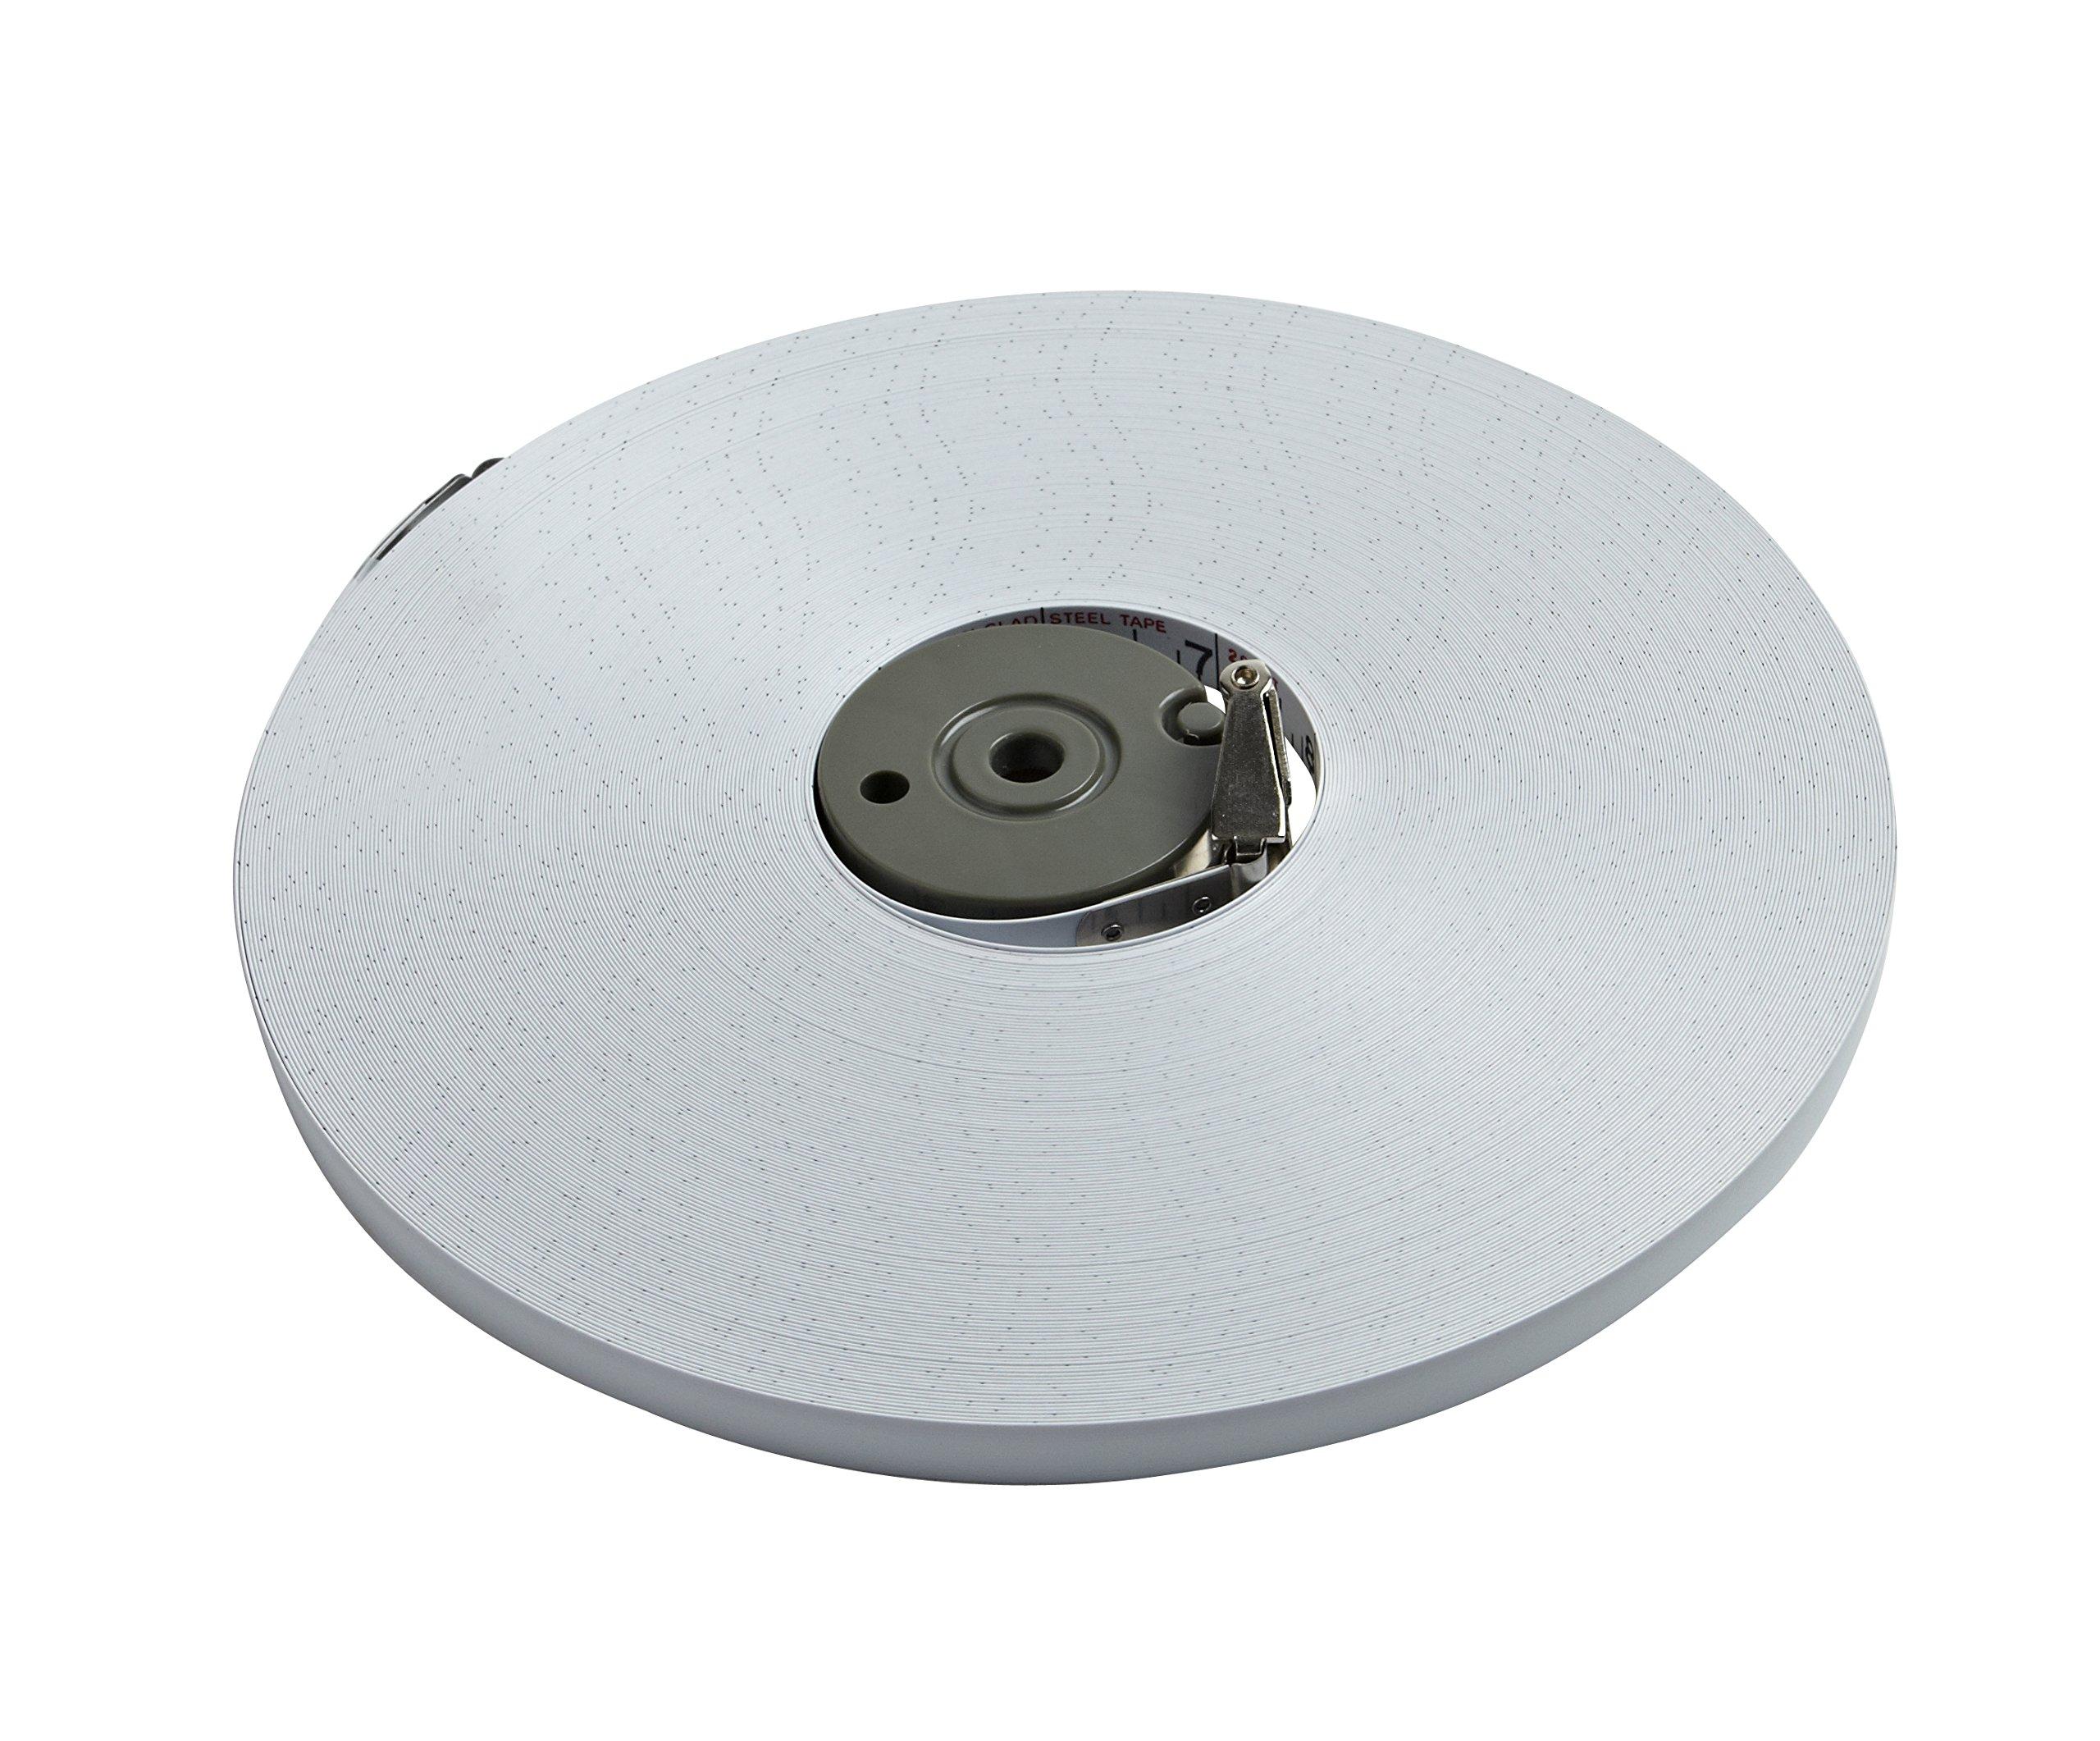 Keson NRF18200#18 Series Nylon Tape Refill (Graduations: ft, in. 1/8), 200-Foot